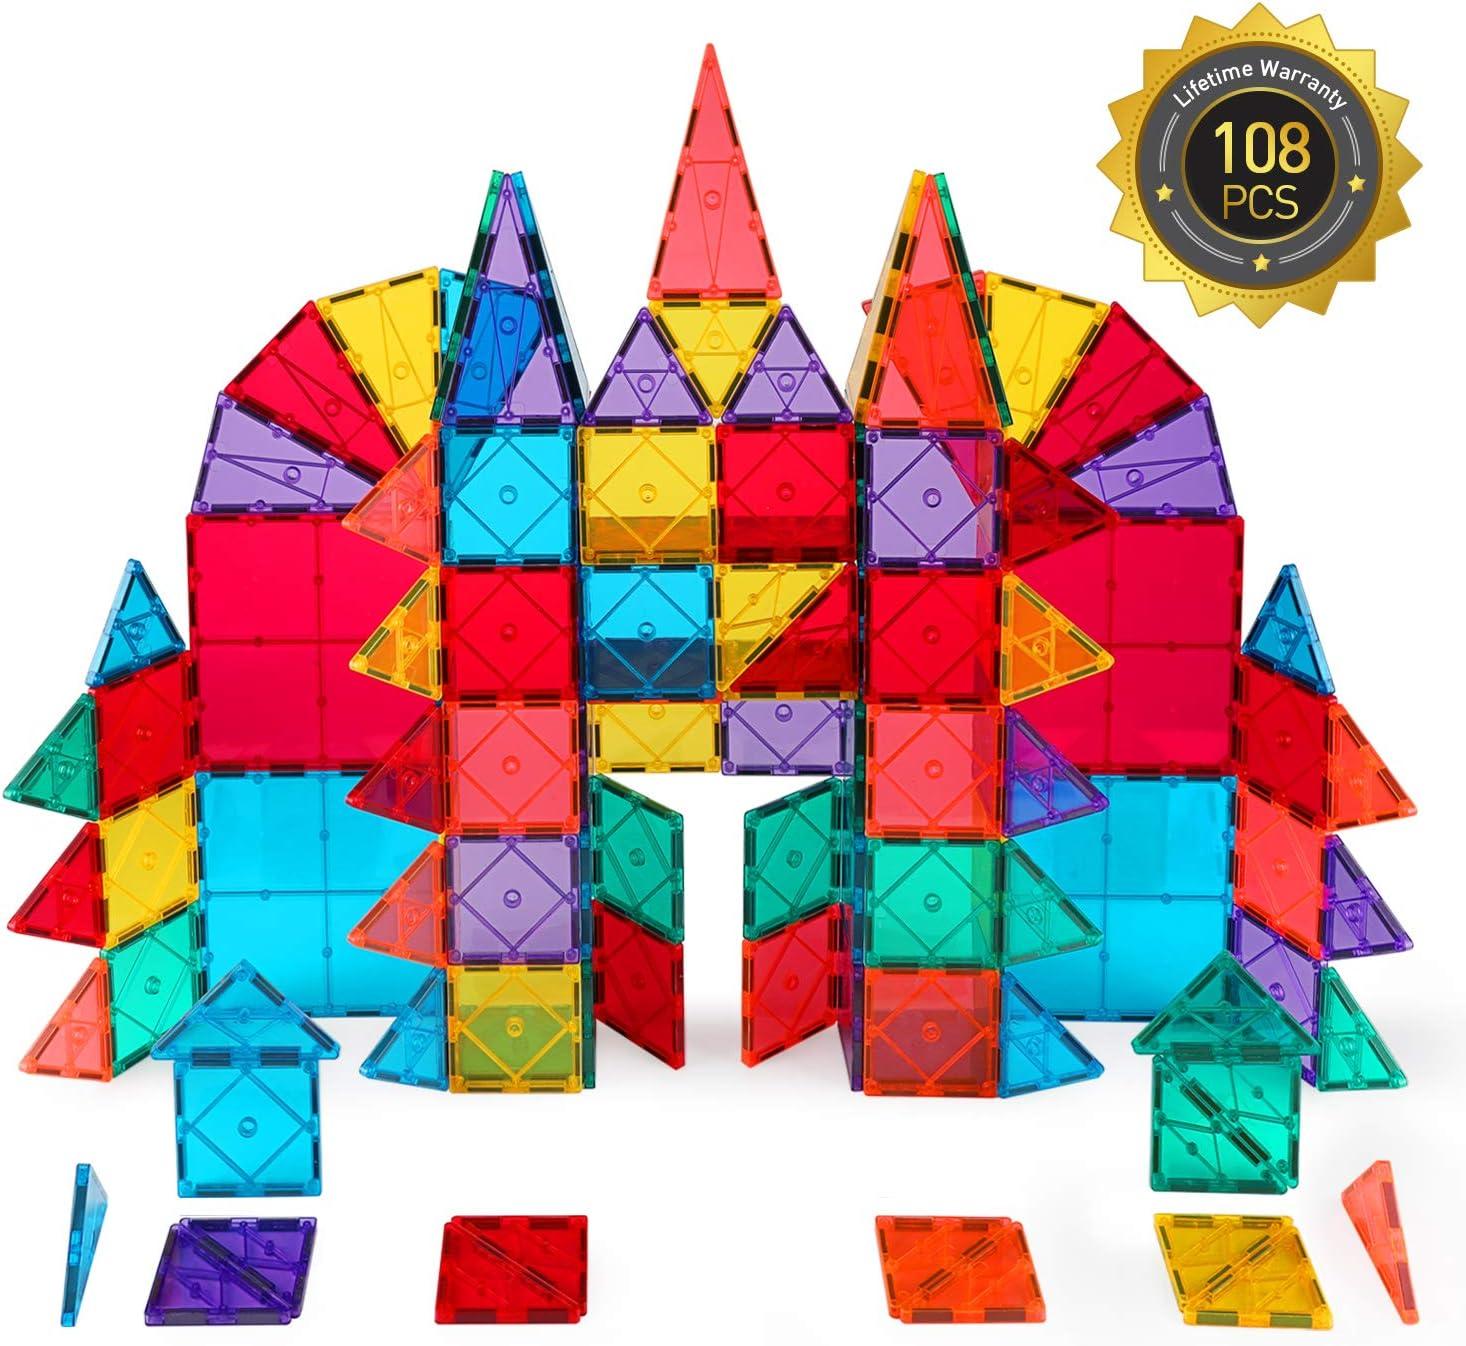 Educational STEM Toys for Boys Girls Upgraded-68 pcs Dopobo Magnetic Tiles Magnet Building Tiles : Clear 3D Magnetic Building Blocks Set for Kids Toddlers